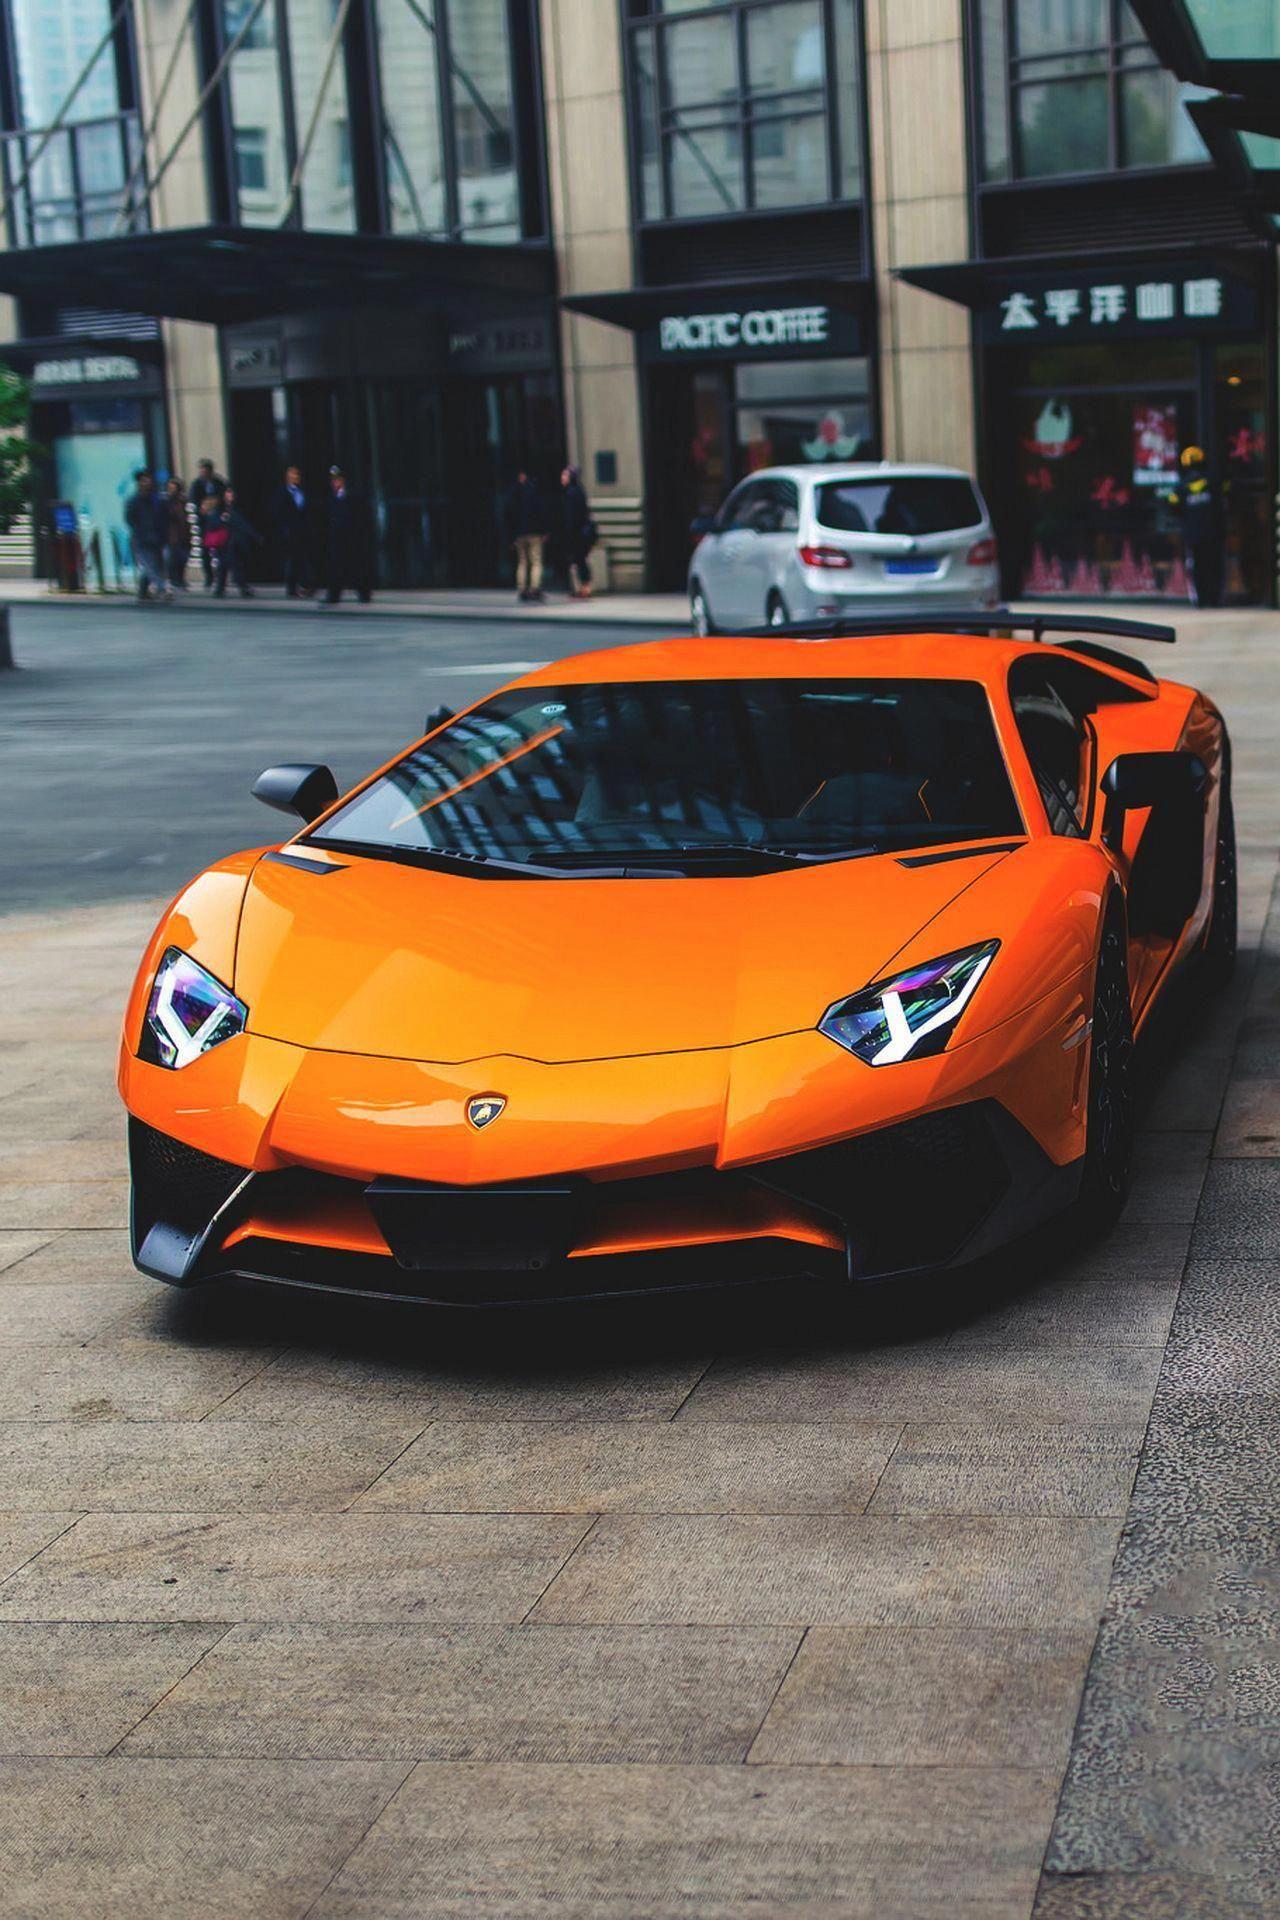 Orange Lamborghini Aventador SV #bestsportscars,newsportscars,nicesportscars,exoticcarsdubai,exoticcarsandgirls,coolsportscars,fastsportscars,hypersportcar,luxurysportcar,newsportscars #Lamborghini #lamborghiniaventador